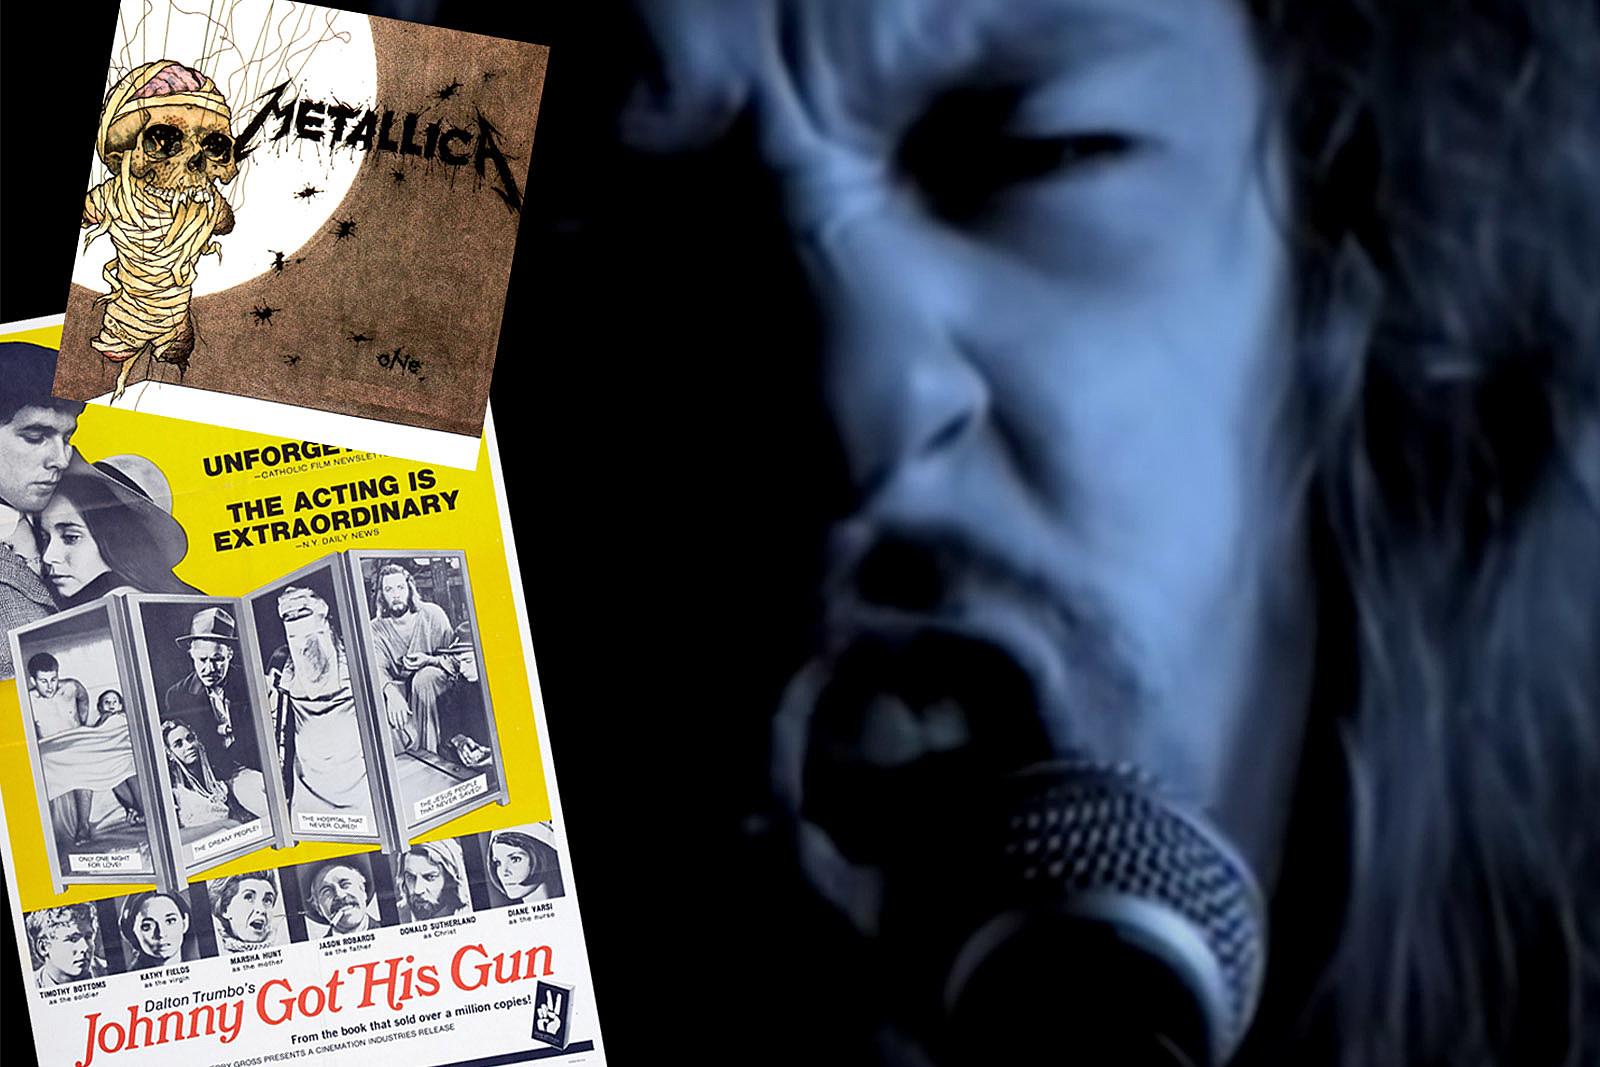 50 Years Ago: 'Johnny Got His Gun' Begins Its Journey to Inspiring Metallica